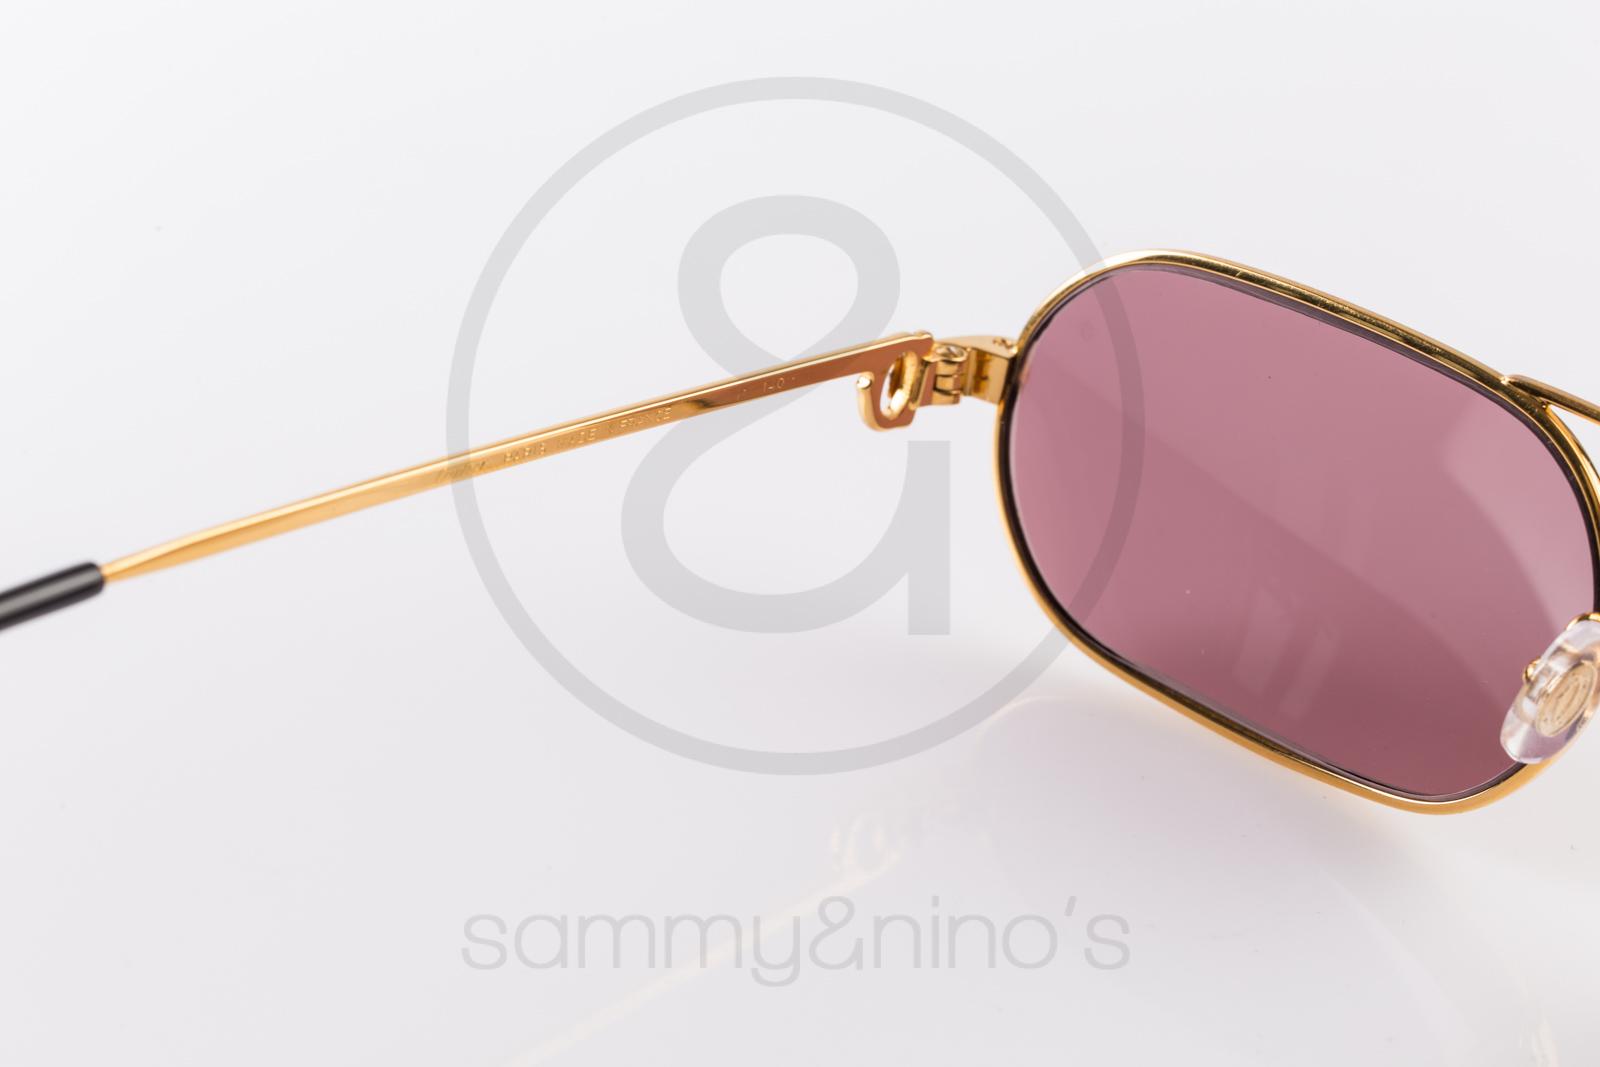 856b9a8f7afa82 Cartier Must Louis 55-20 – Sammy   Nino s Store